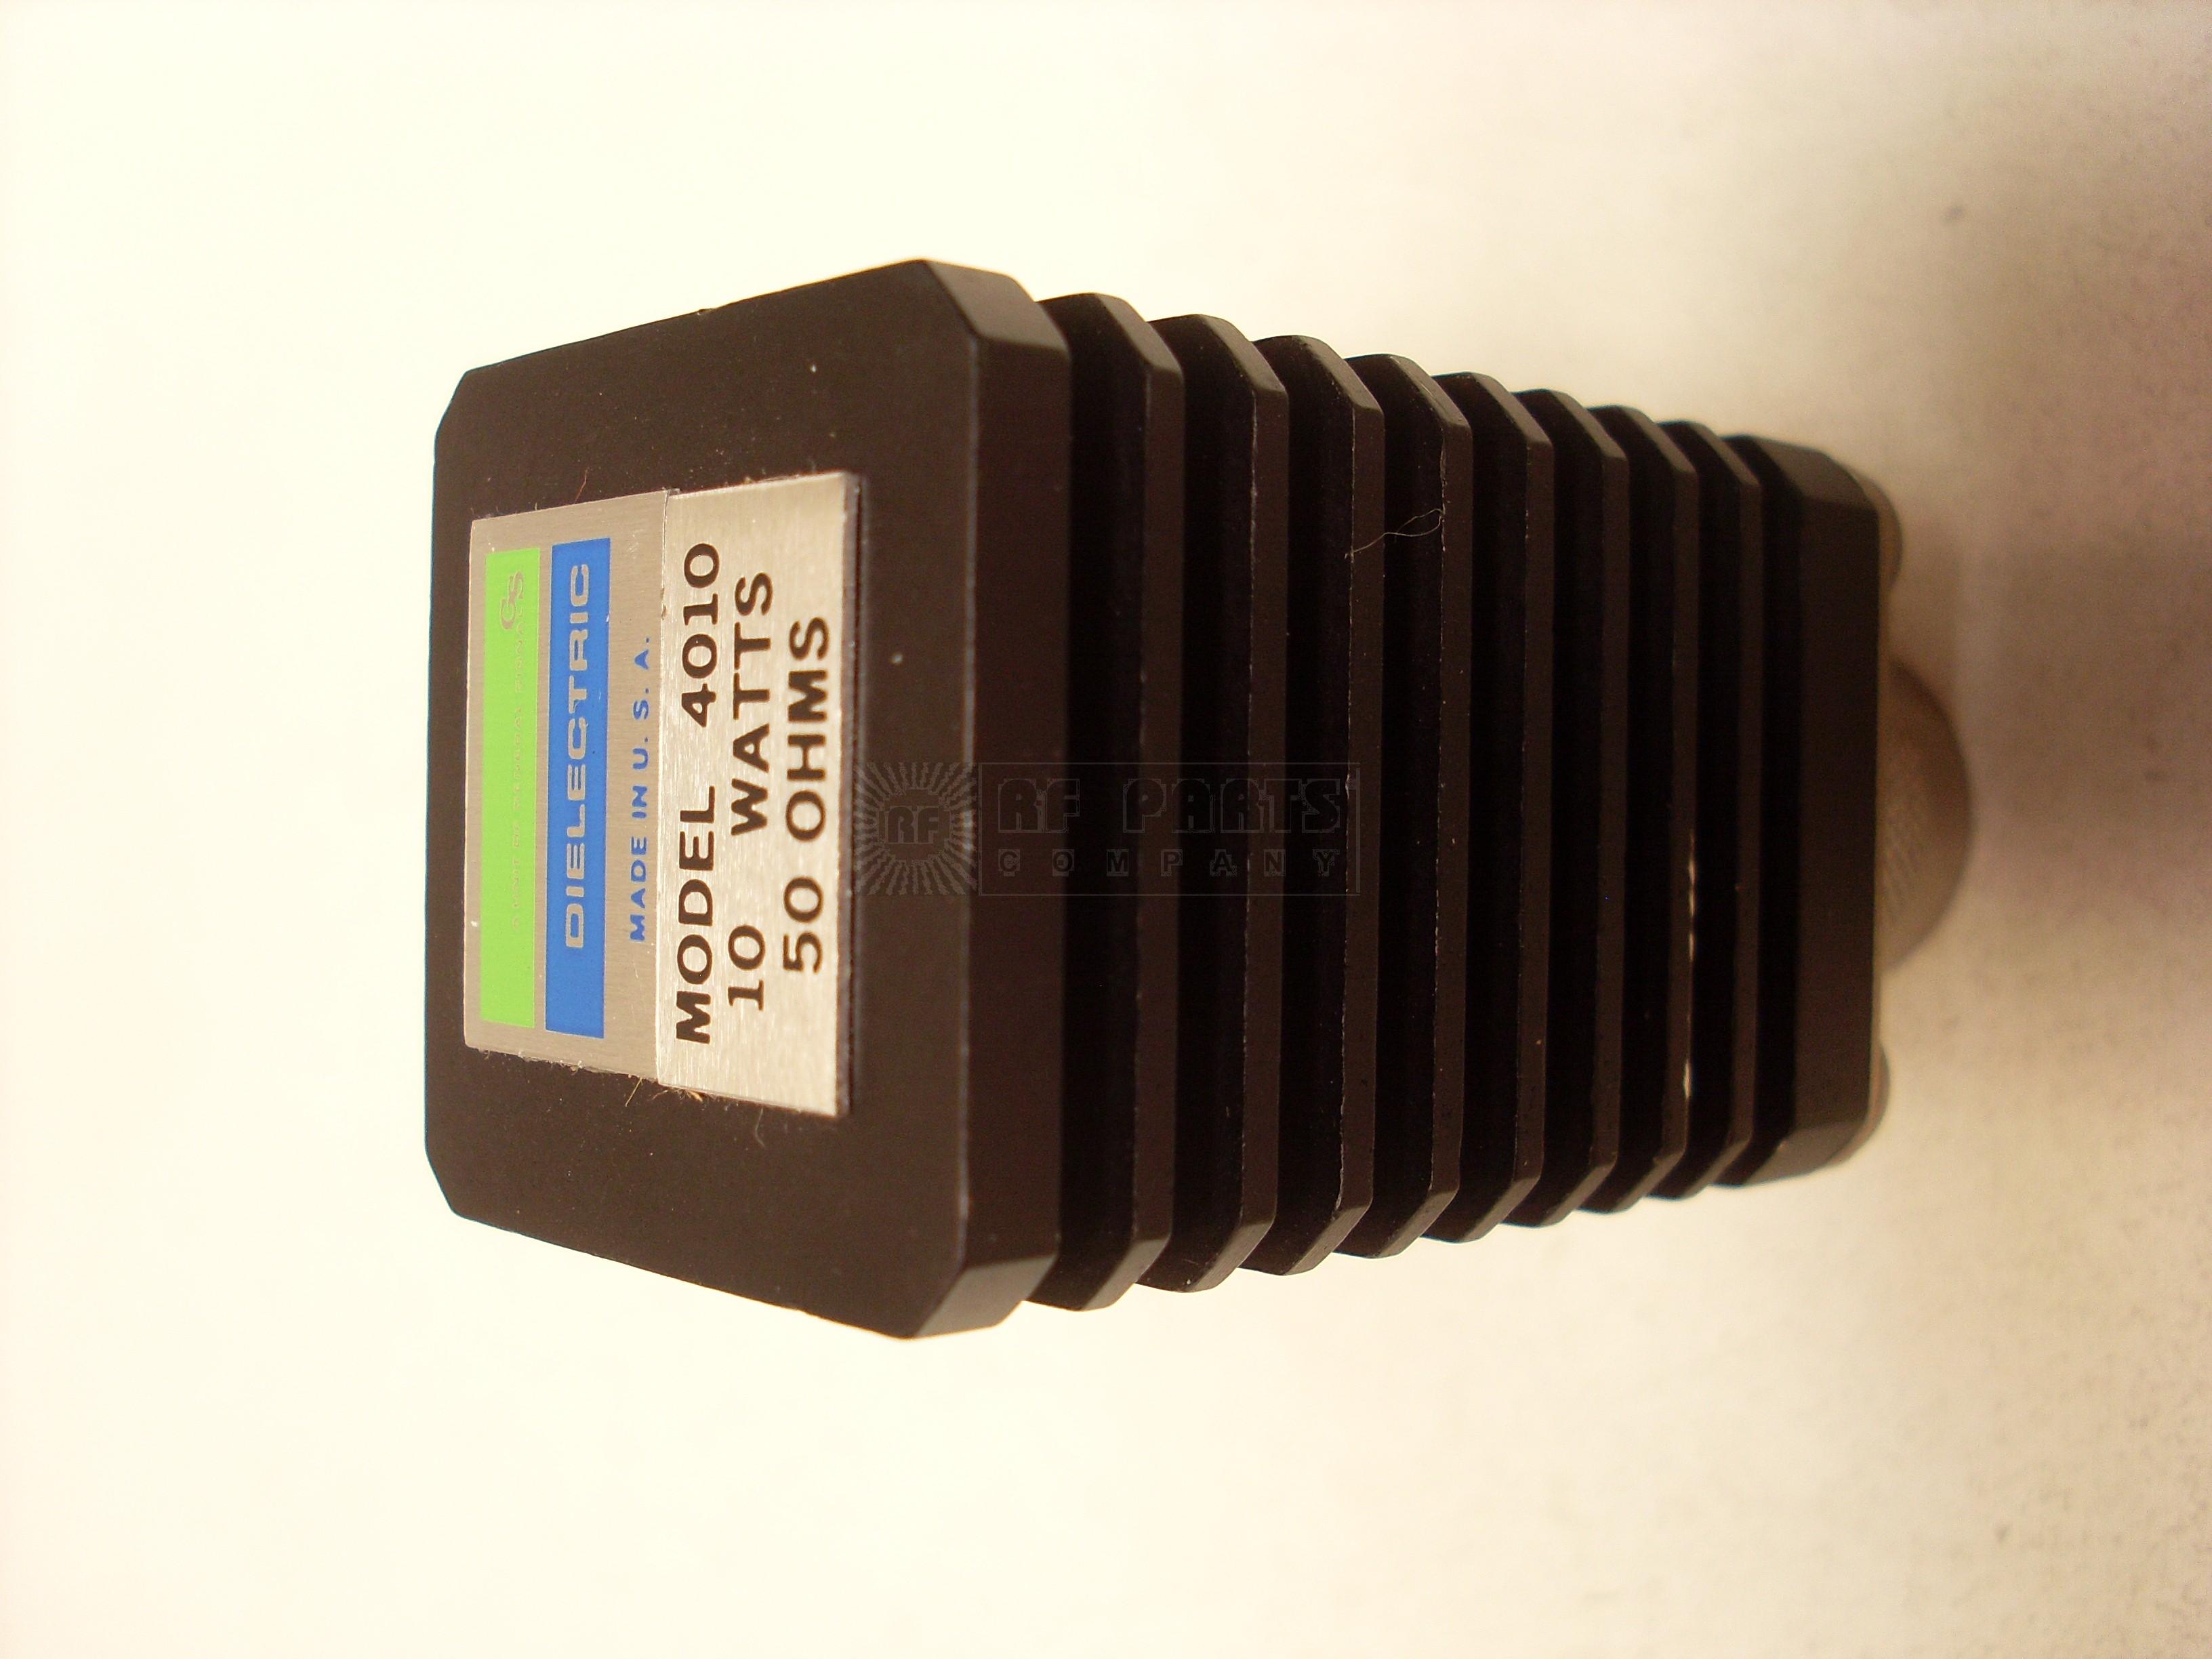 4010 Dummy load, 10w Type-N Female, Coaxial Dynamics